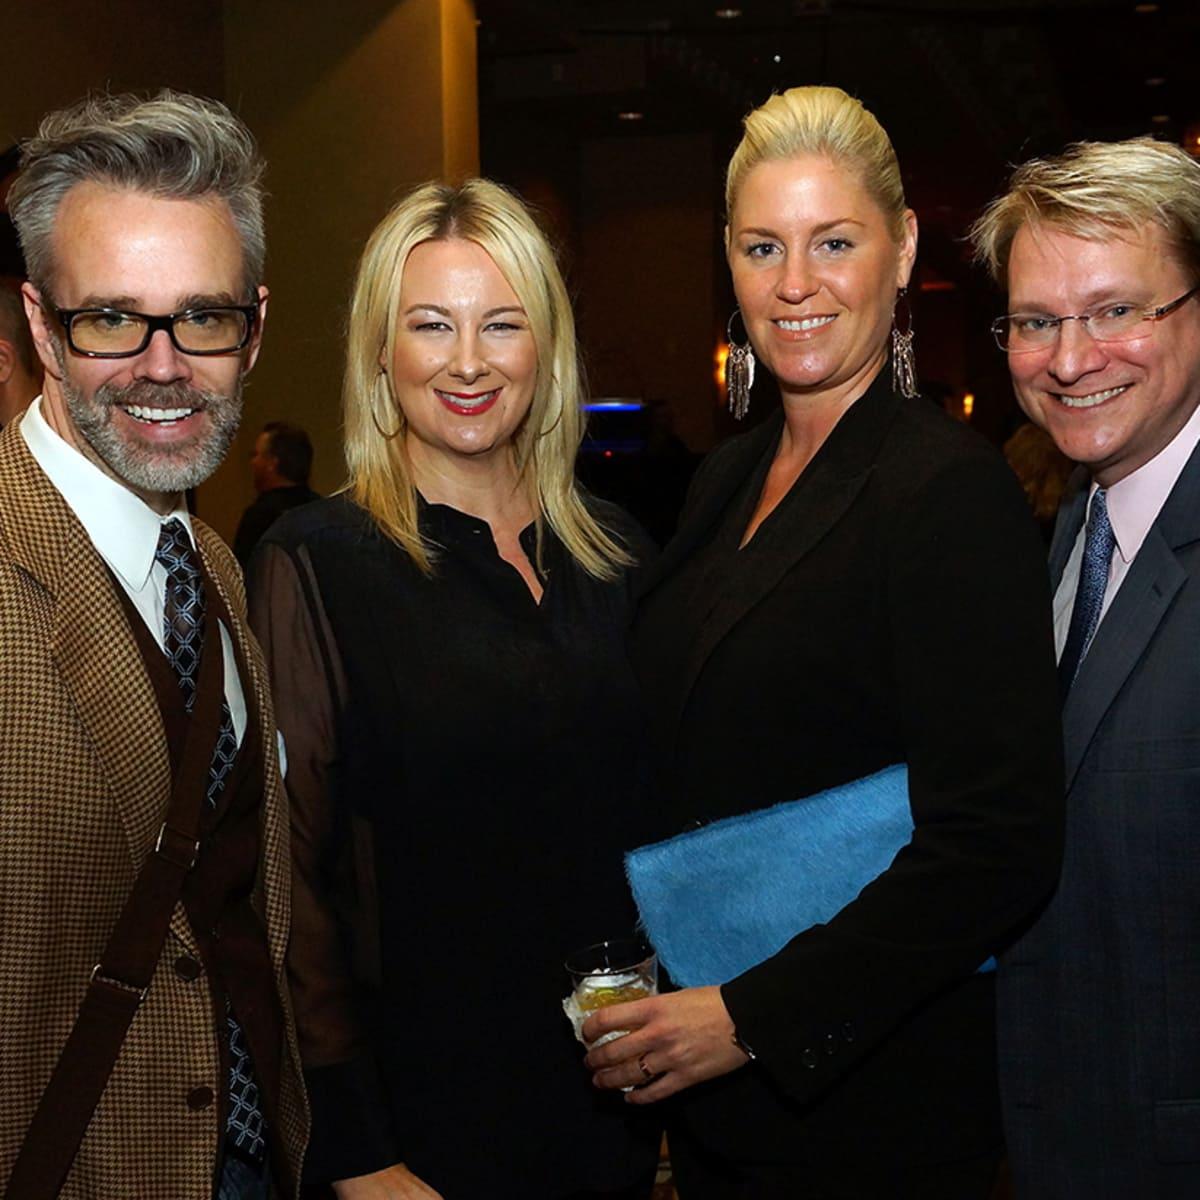 K9s4COPS Gala Michael Pearce, Libby Cagle, Lauren Taft and Matthew Burras